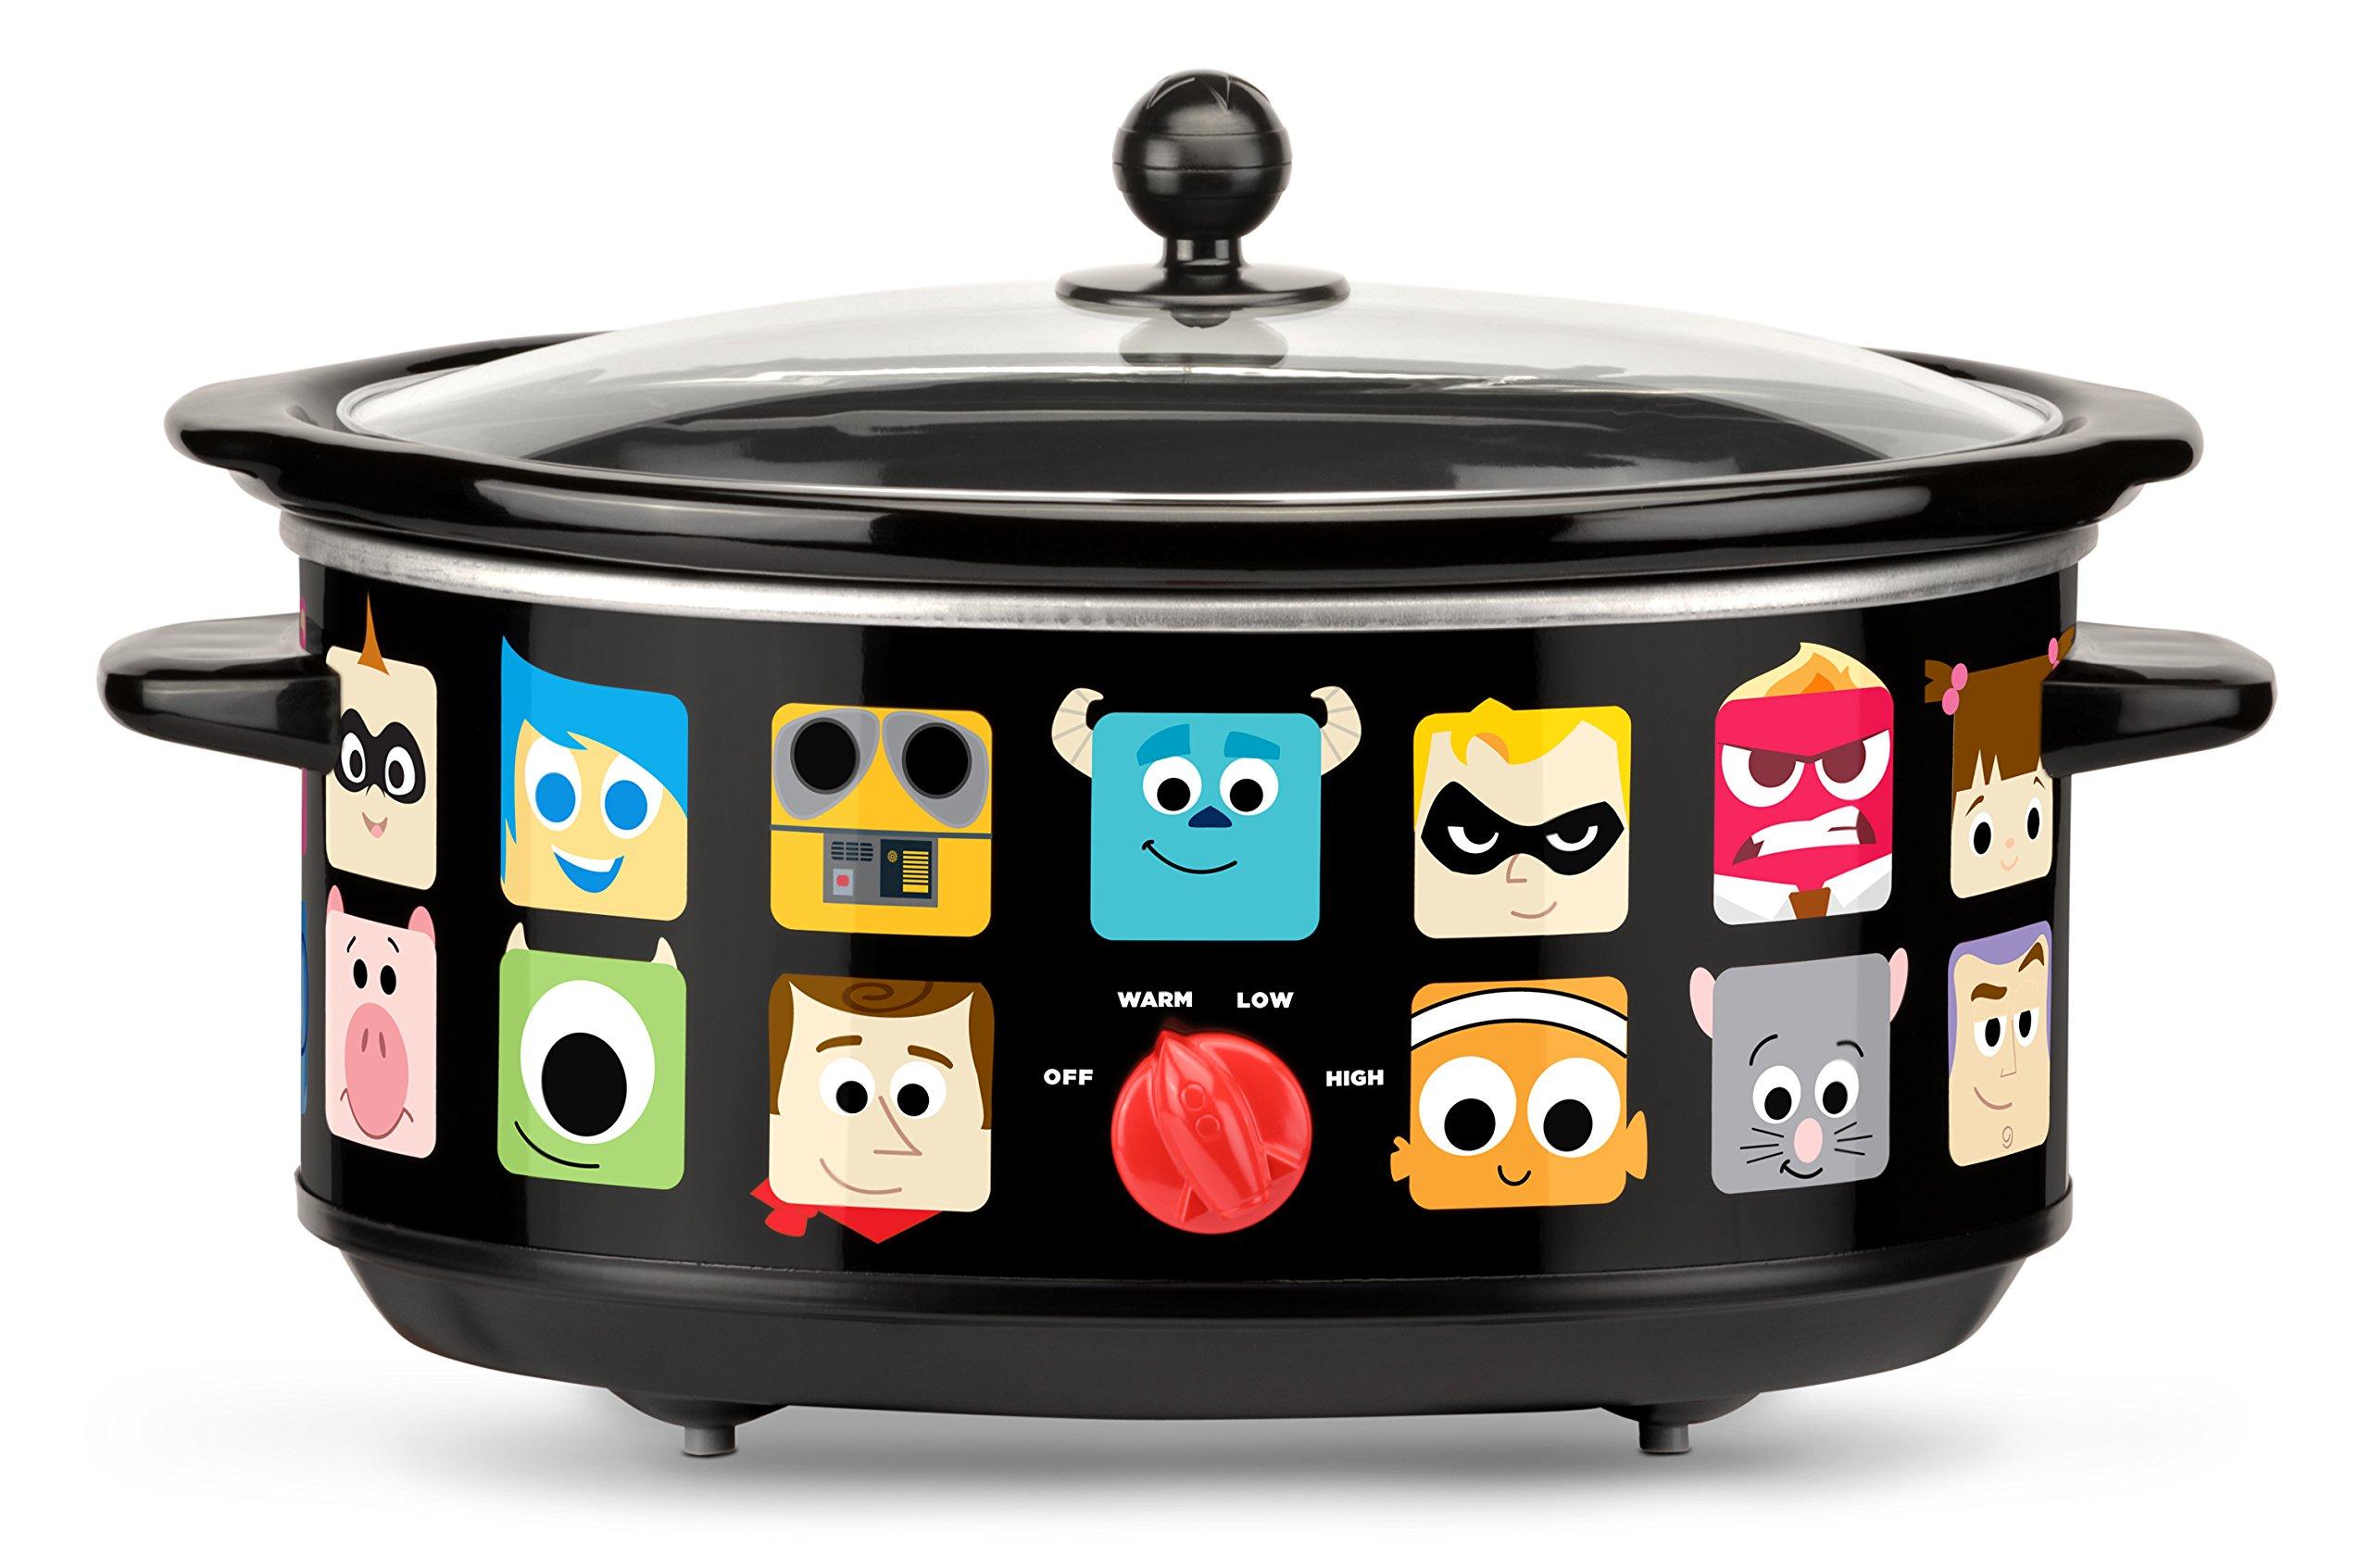 Disney DPX-7 Disney Pixar Slow Cooker Slow Cooker, 7 quart, Black